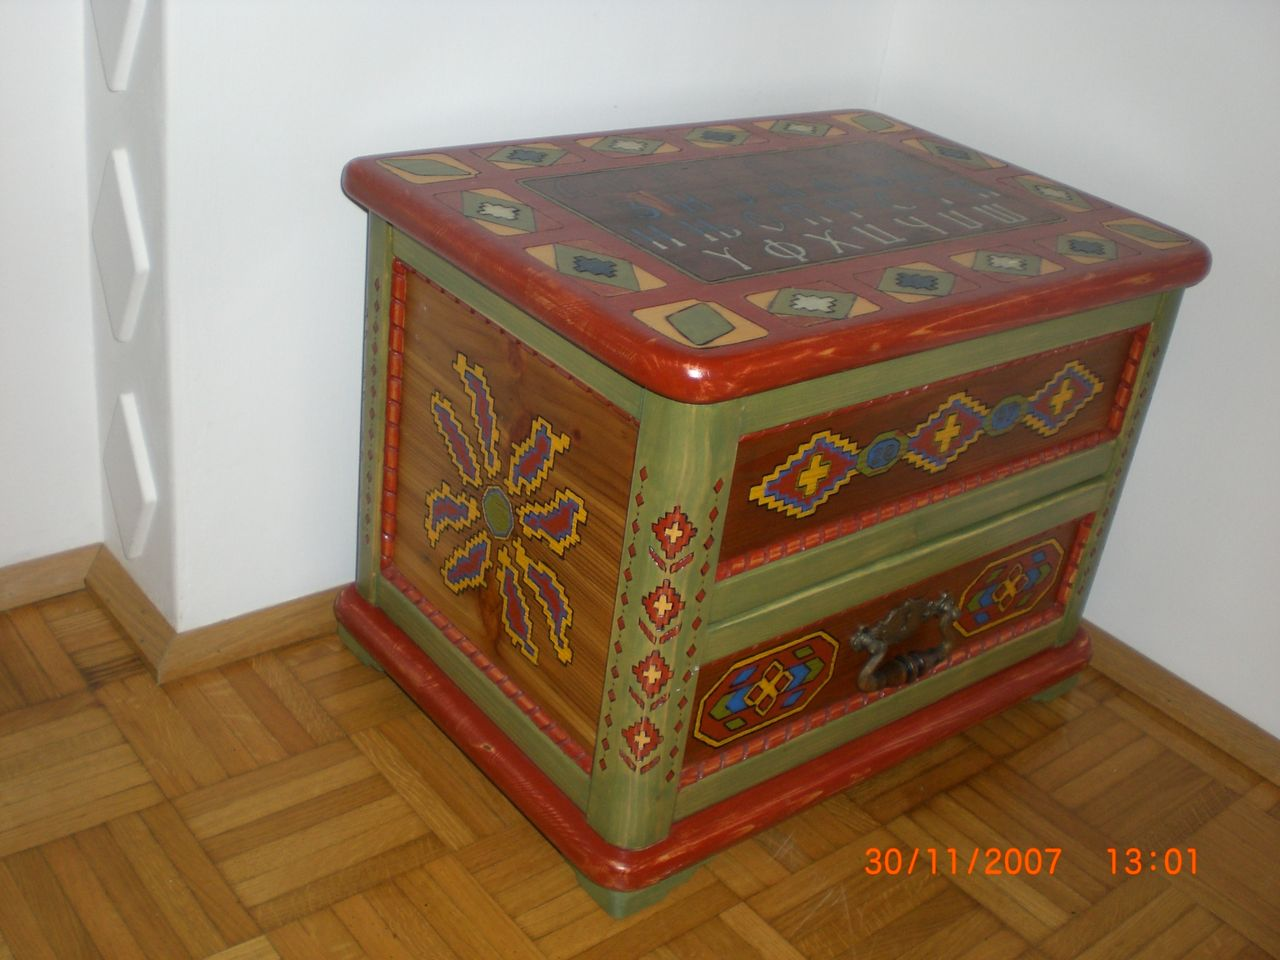 bild truhe holz kunsthandwerk von bozo nikolic bei kunstnet. Black Bedroom Furniture Sets. Home Design Ideas